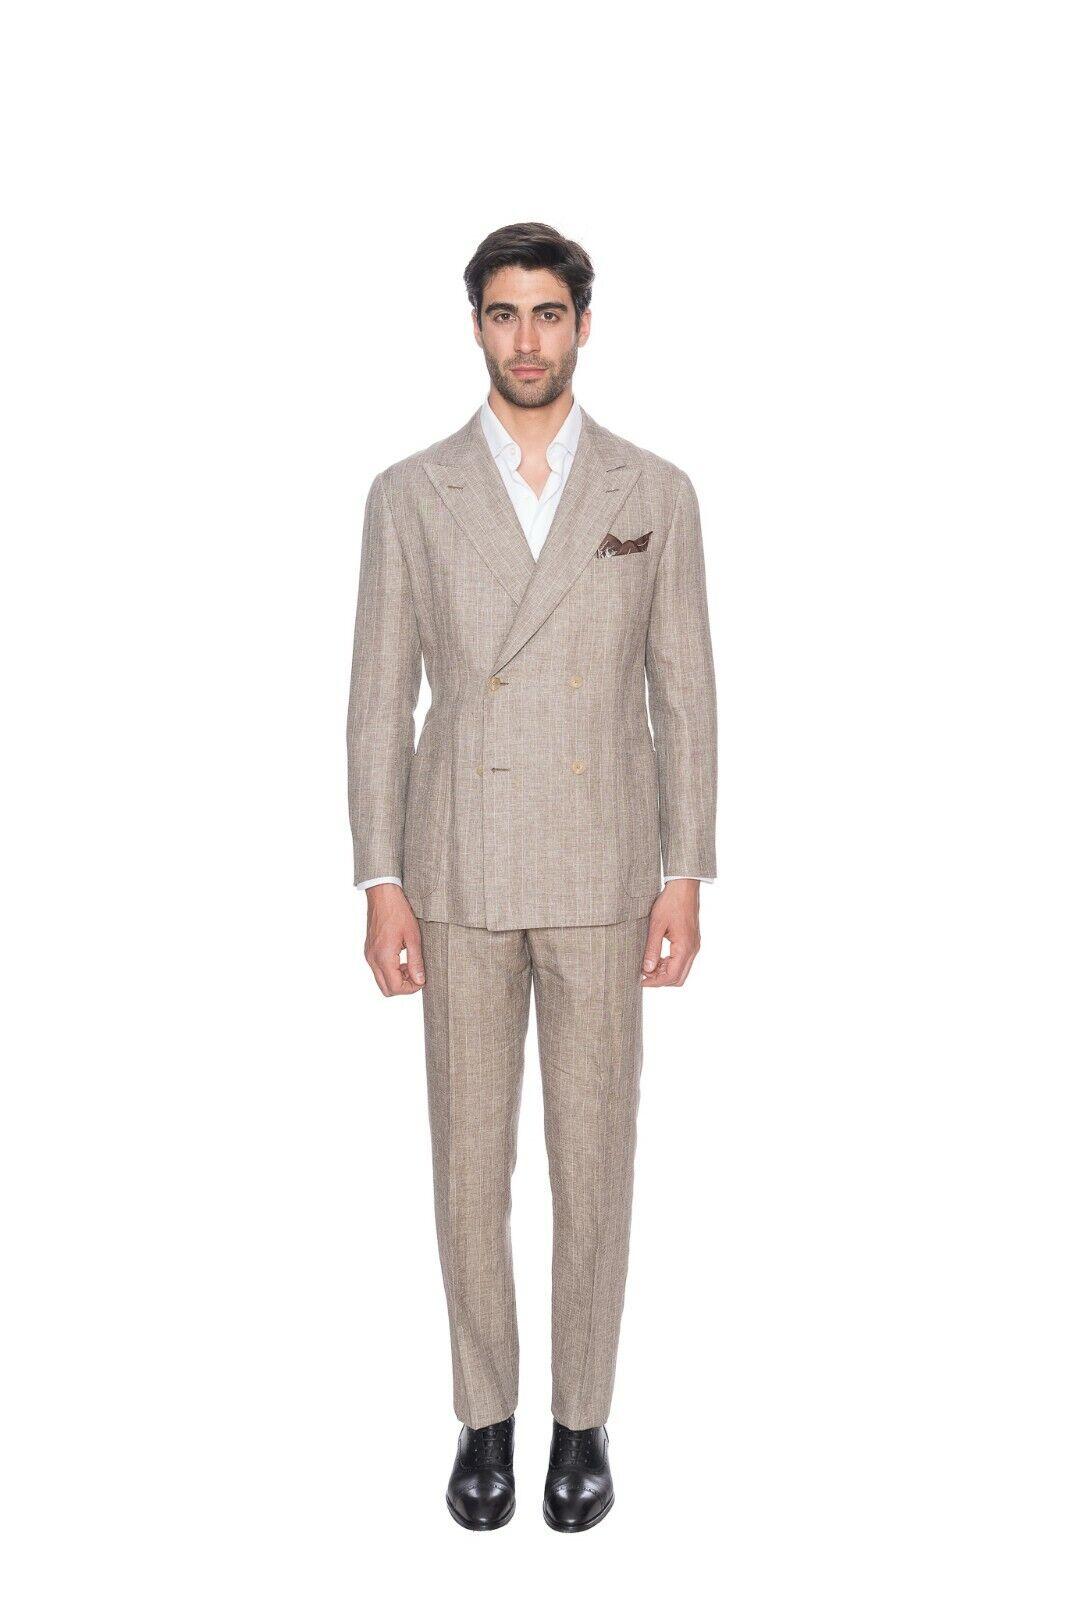 4295 D'AVENZA Light braun Wool Silk Linen Suit Double Breasted 40 US   50 EU